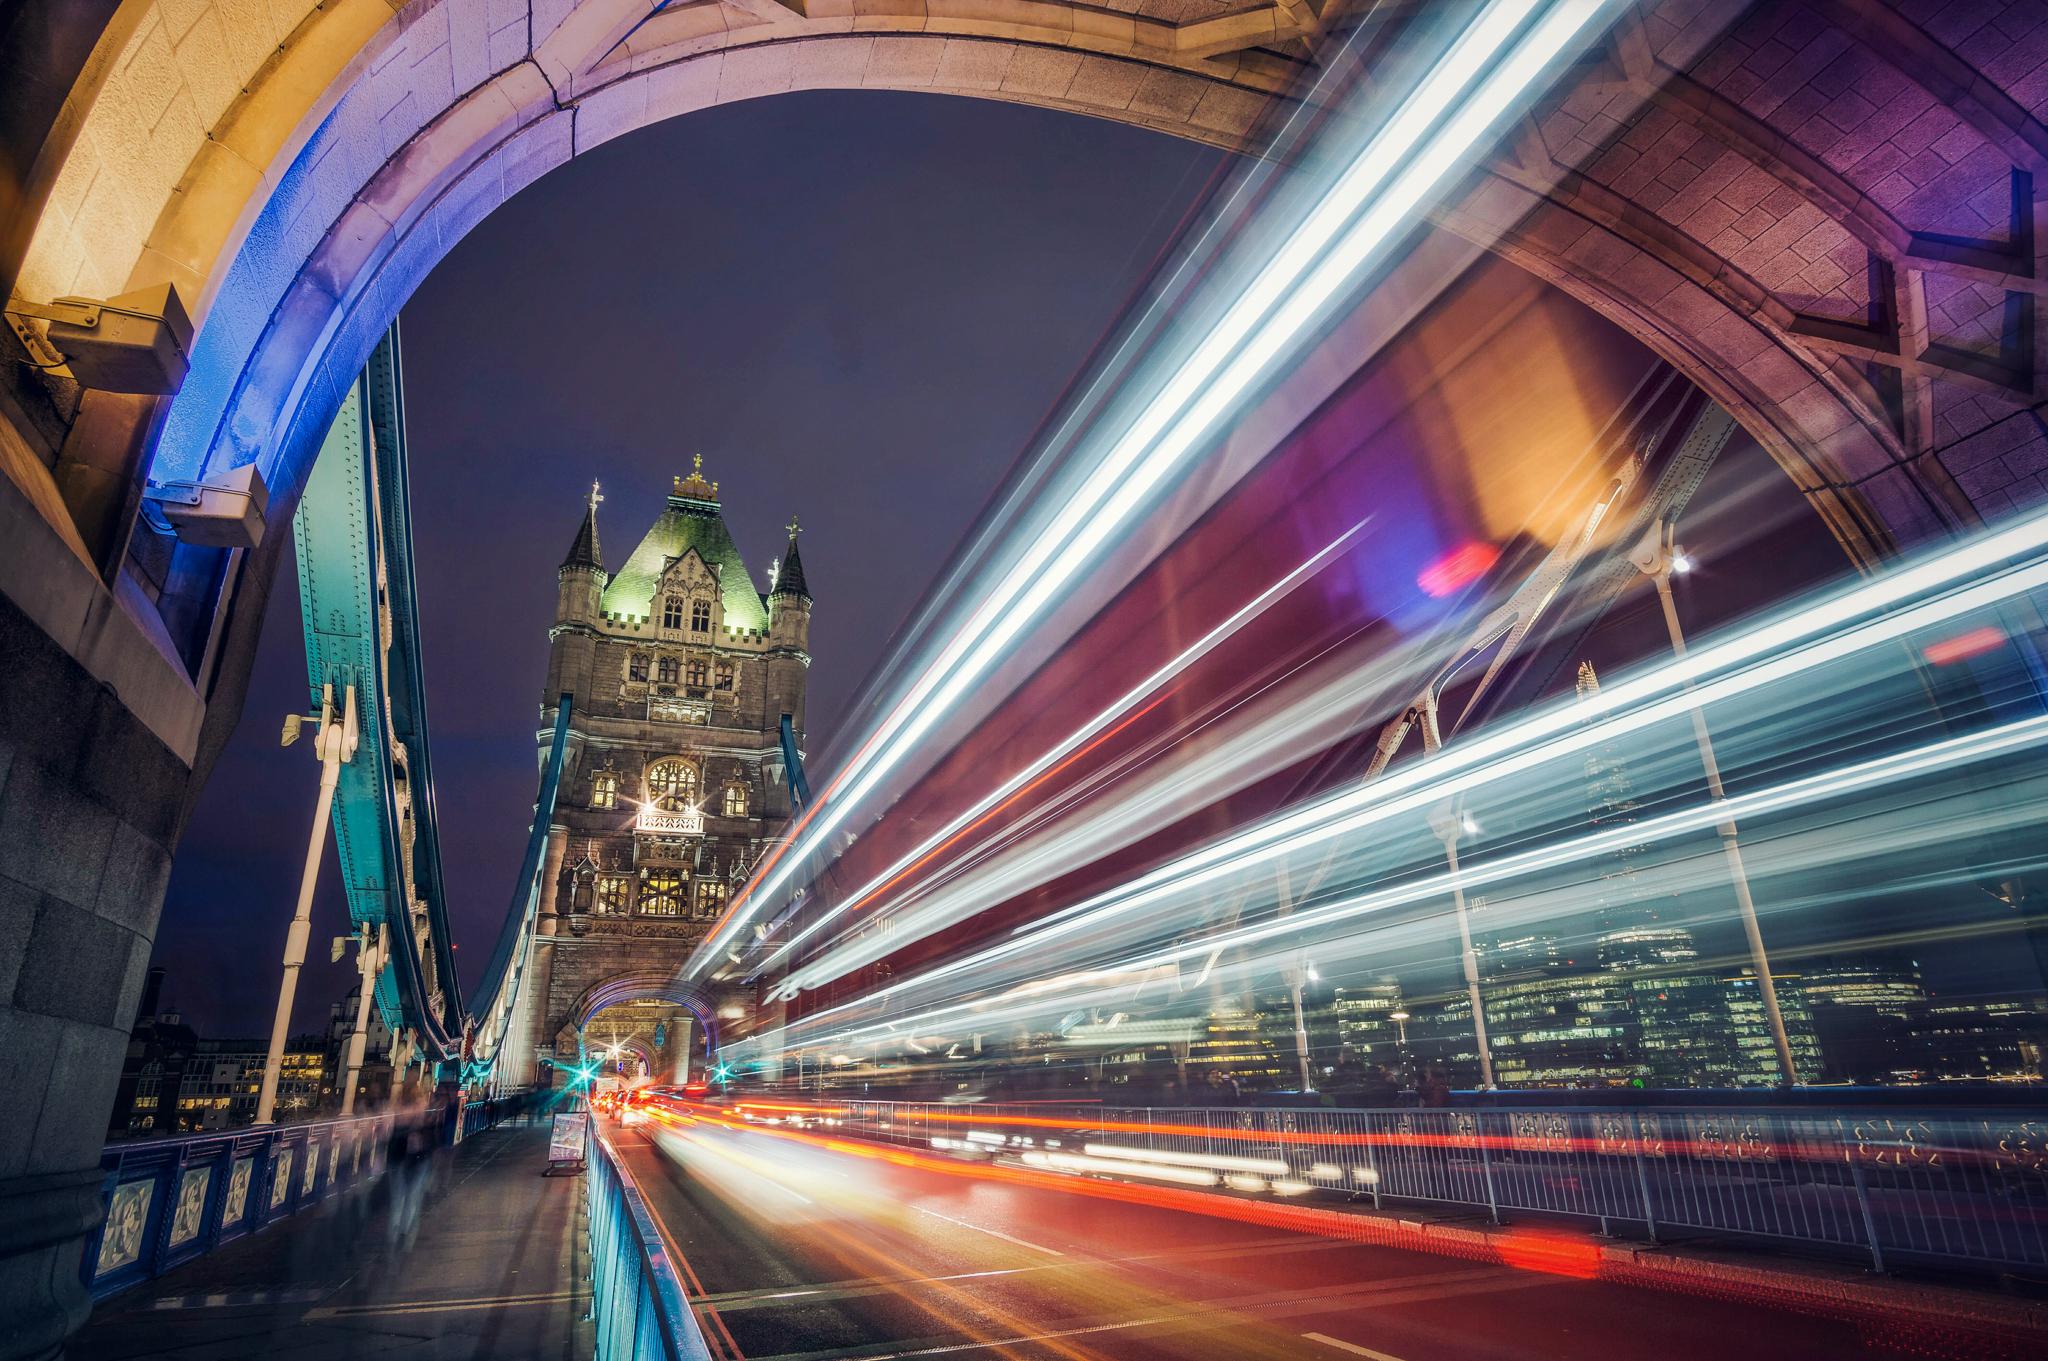 Tower Bridge - London - England 2017